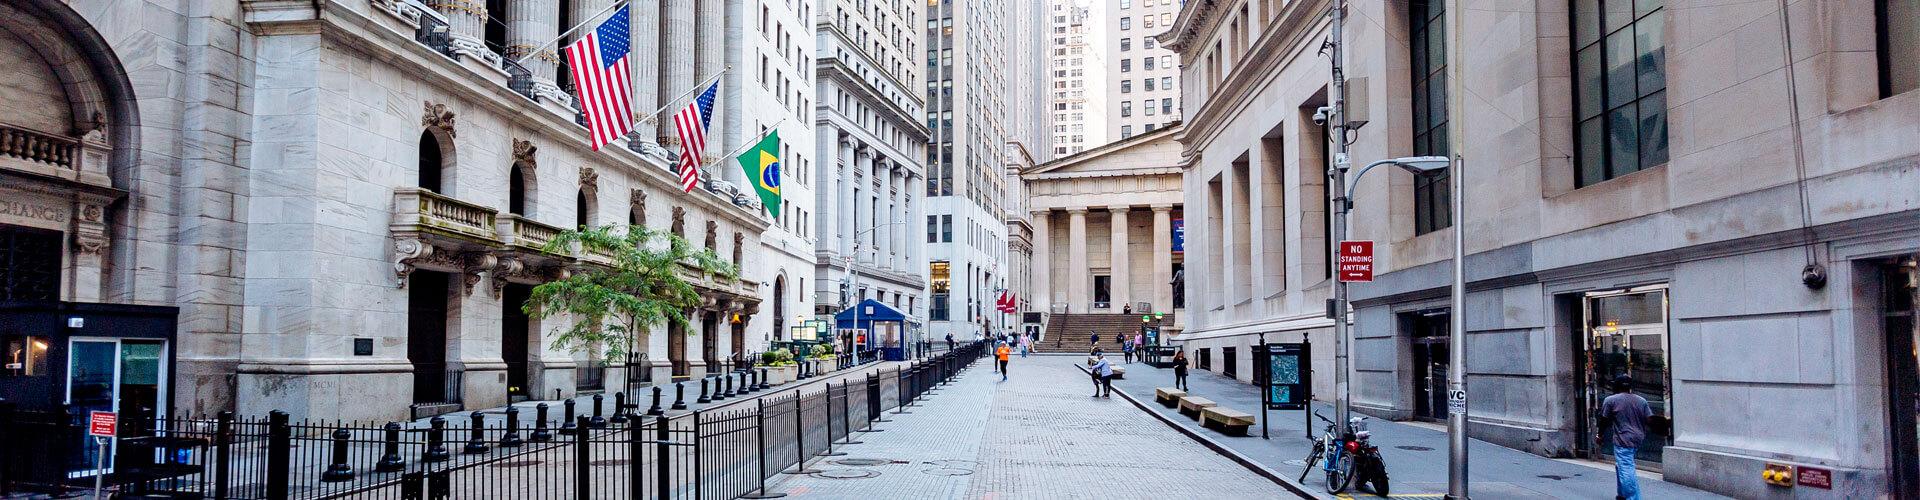 new-york-wall-street-scenery